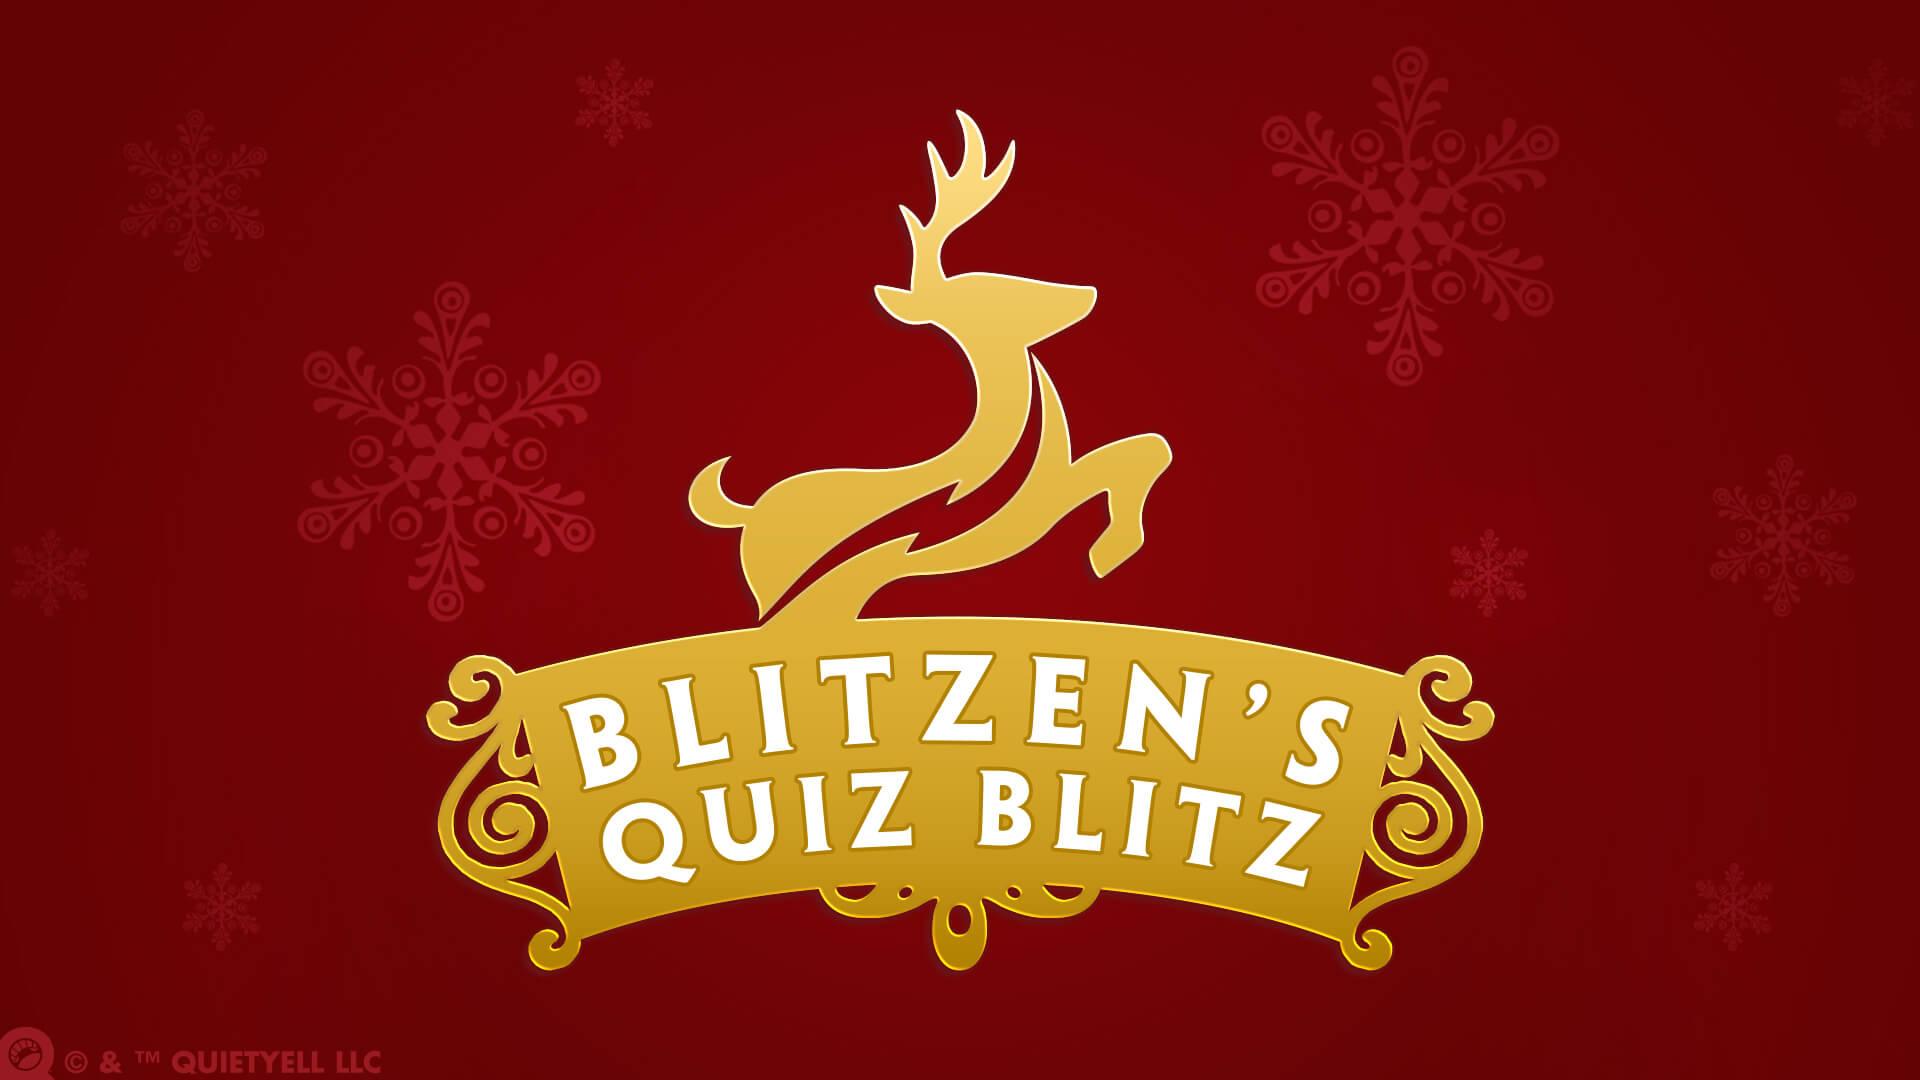 Blitzen's Quiz Blitz Promotional Game Logo by Scott Monaco of QuietYell™ | www.QuietYell.com